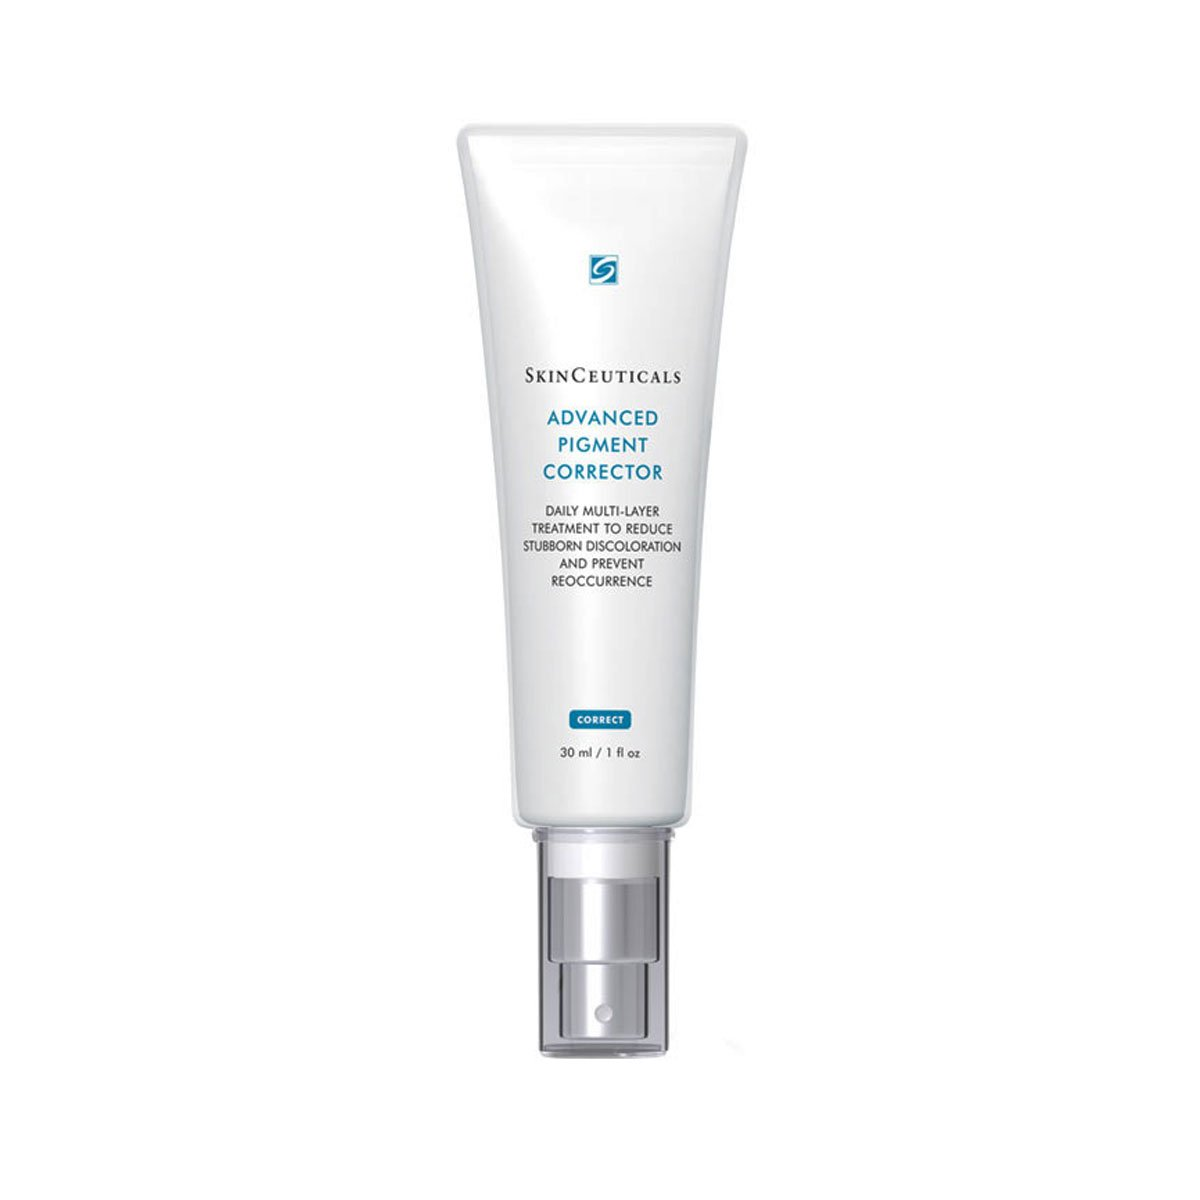 Skinceuticals Correct Advanced Pigment Corrector 30ml [並行輸入品] B073DFLL4D